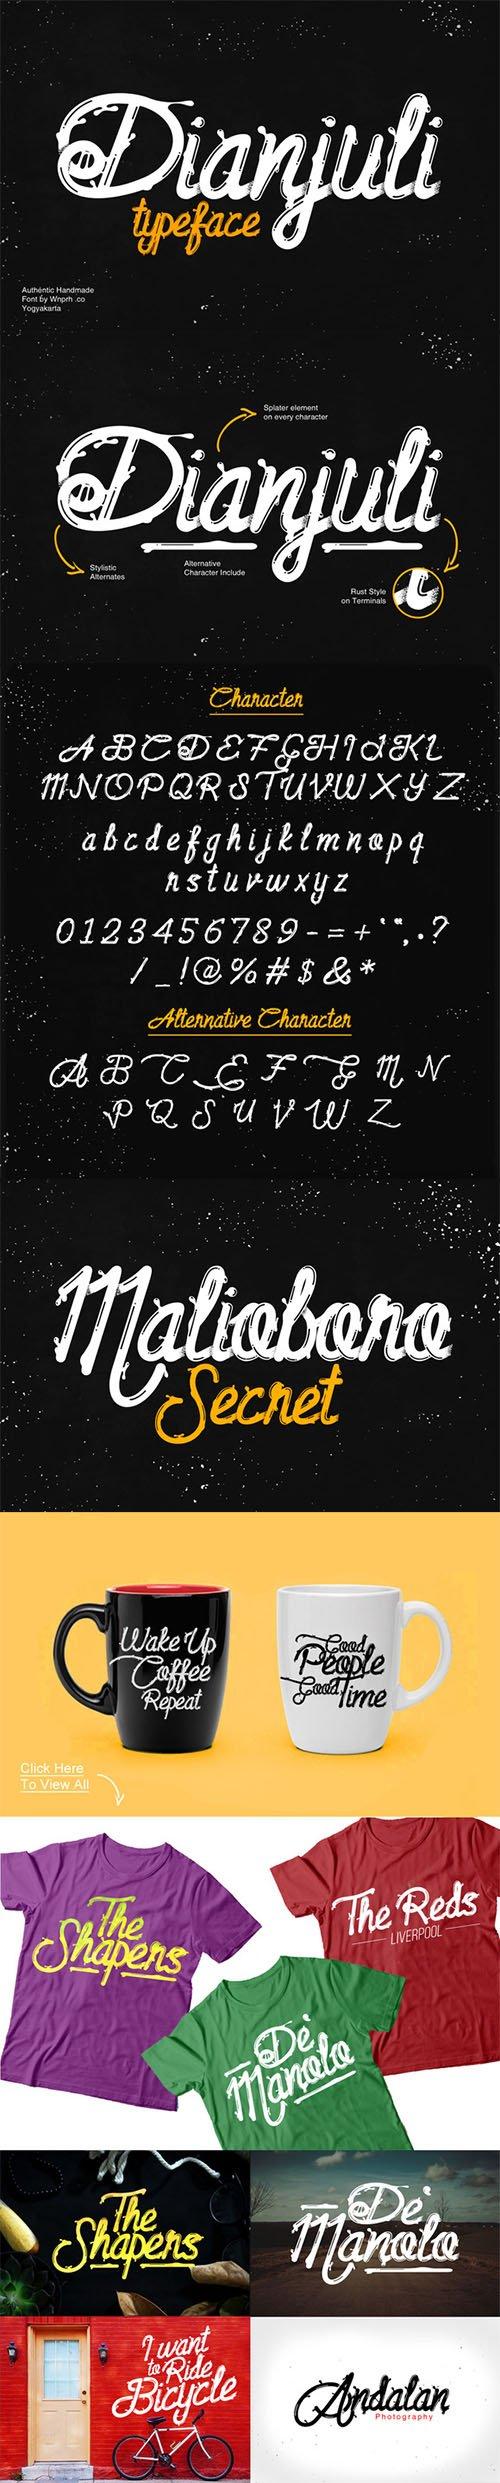 Dianjuli Typeface - Creativemarket 430704